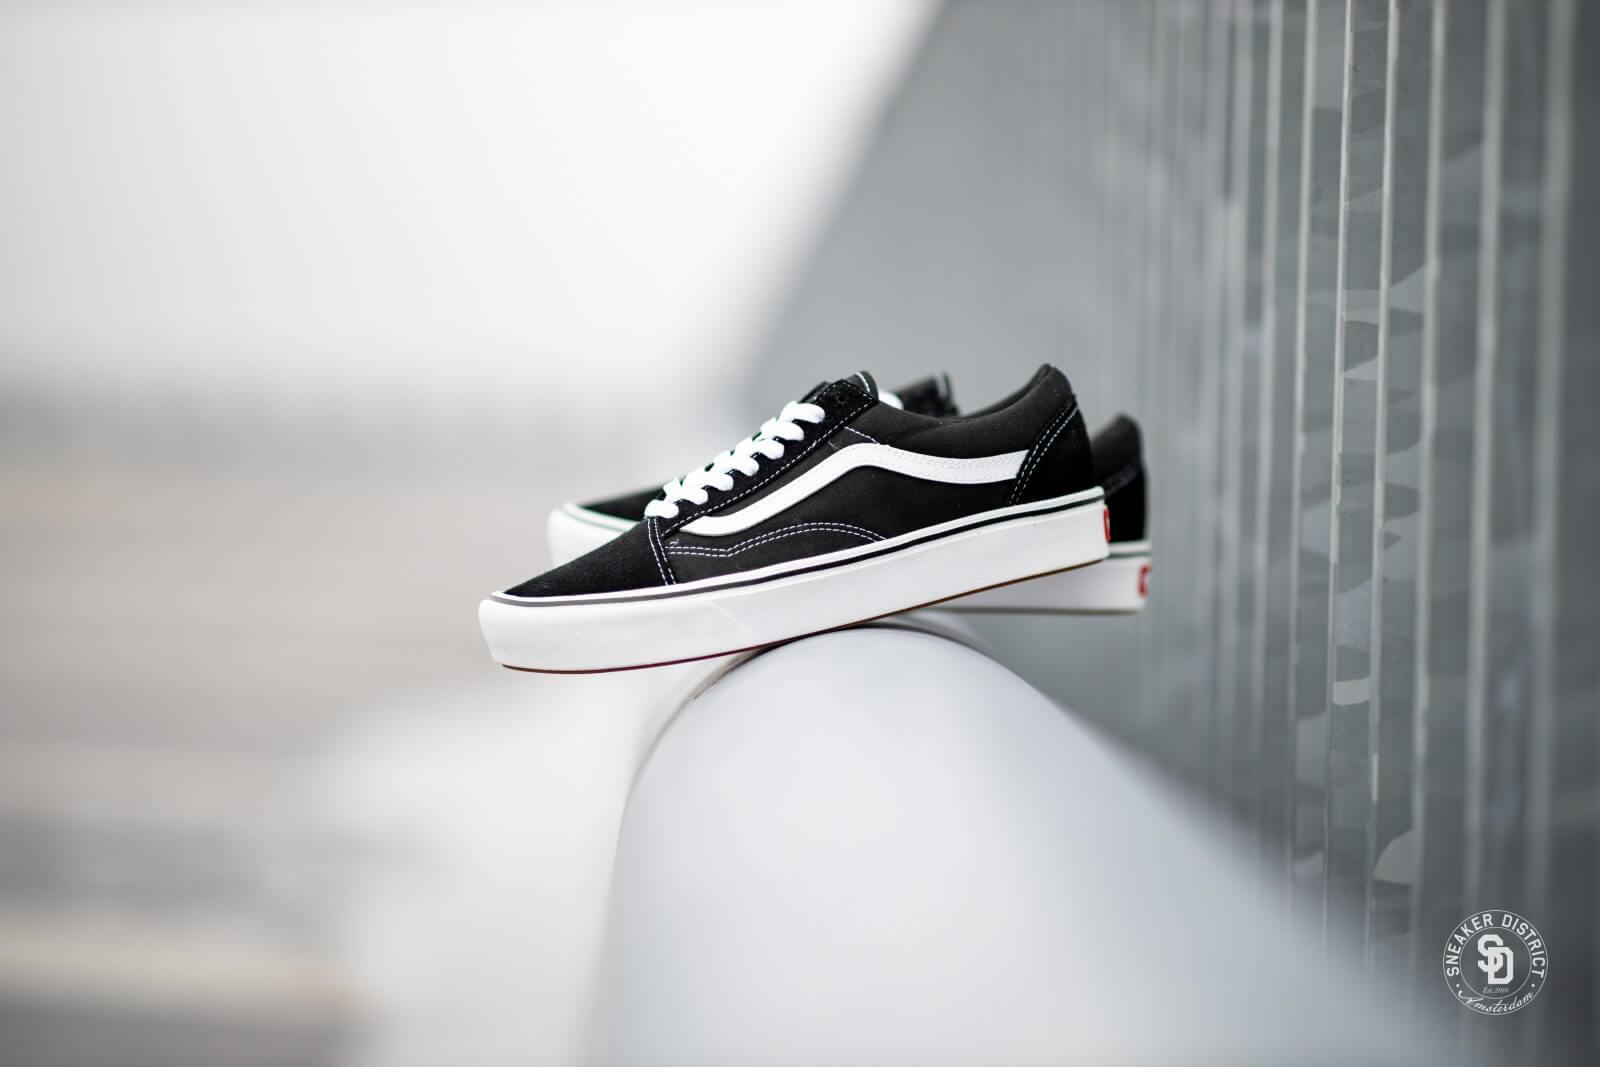 Vans Comfycush Old Skool BlackTrue White VN0A3WMAVNE1